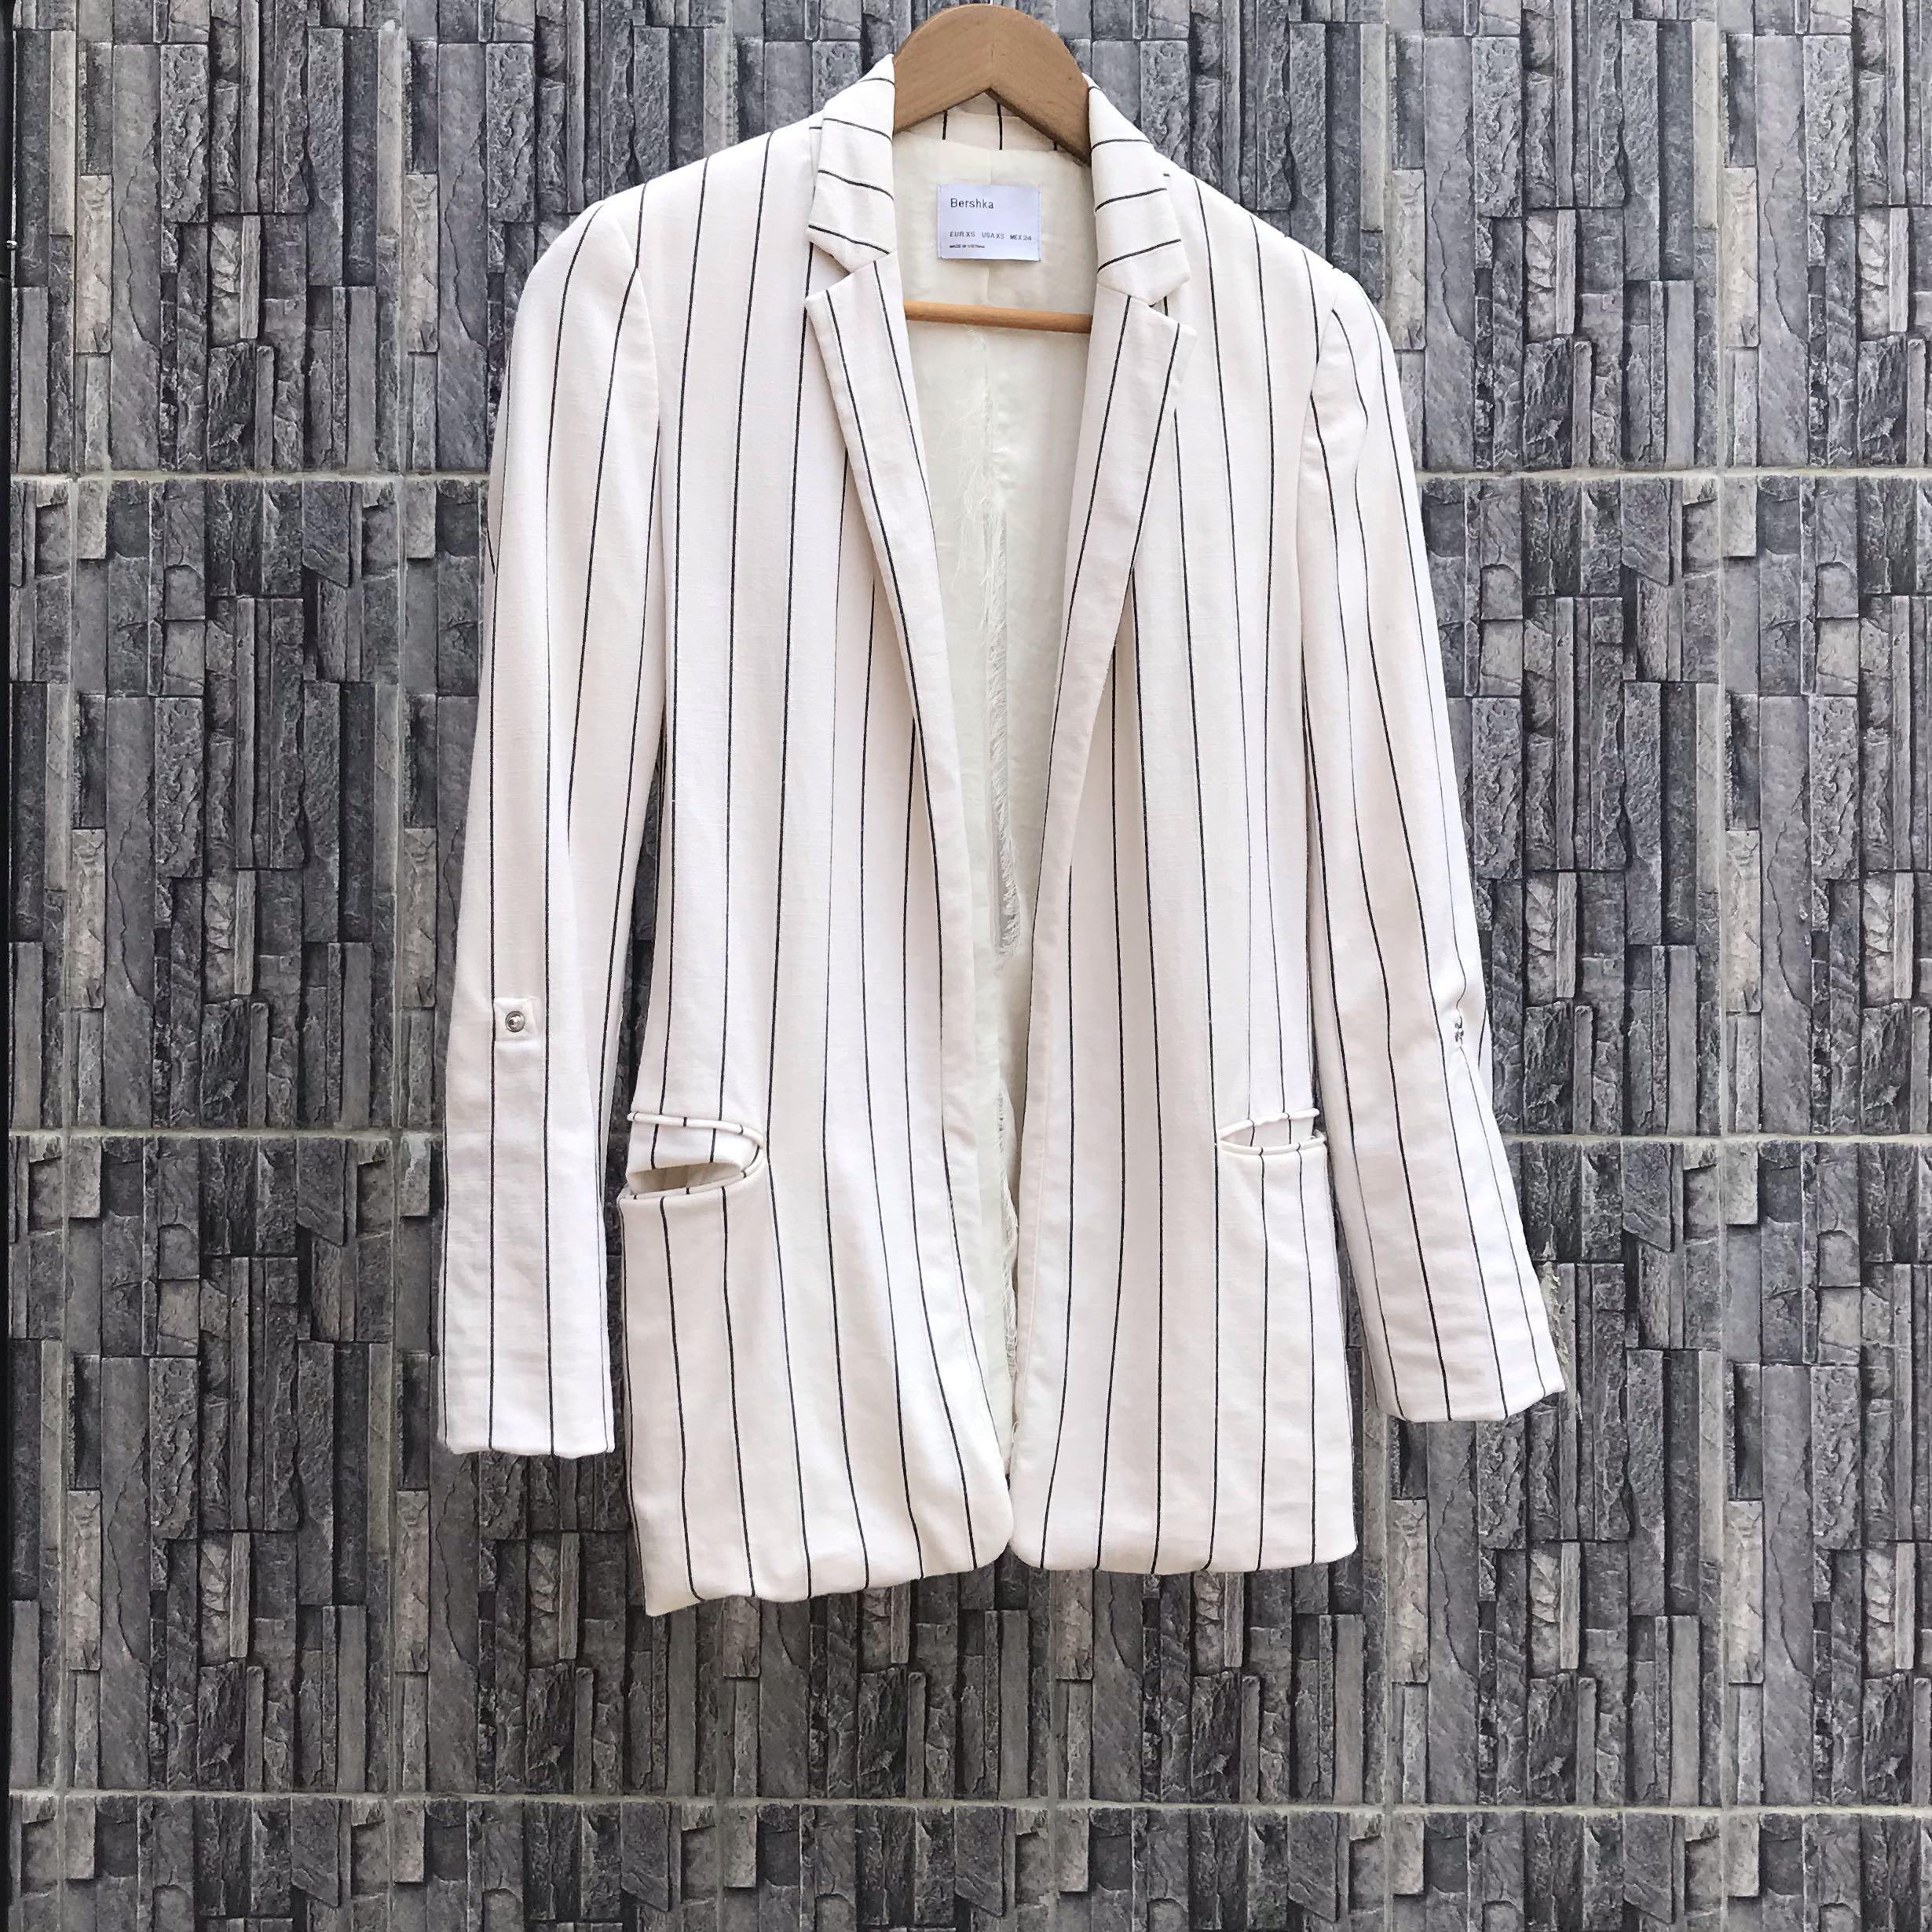 SALE Bershka White Pinstripes Blazer